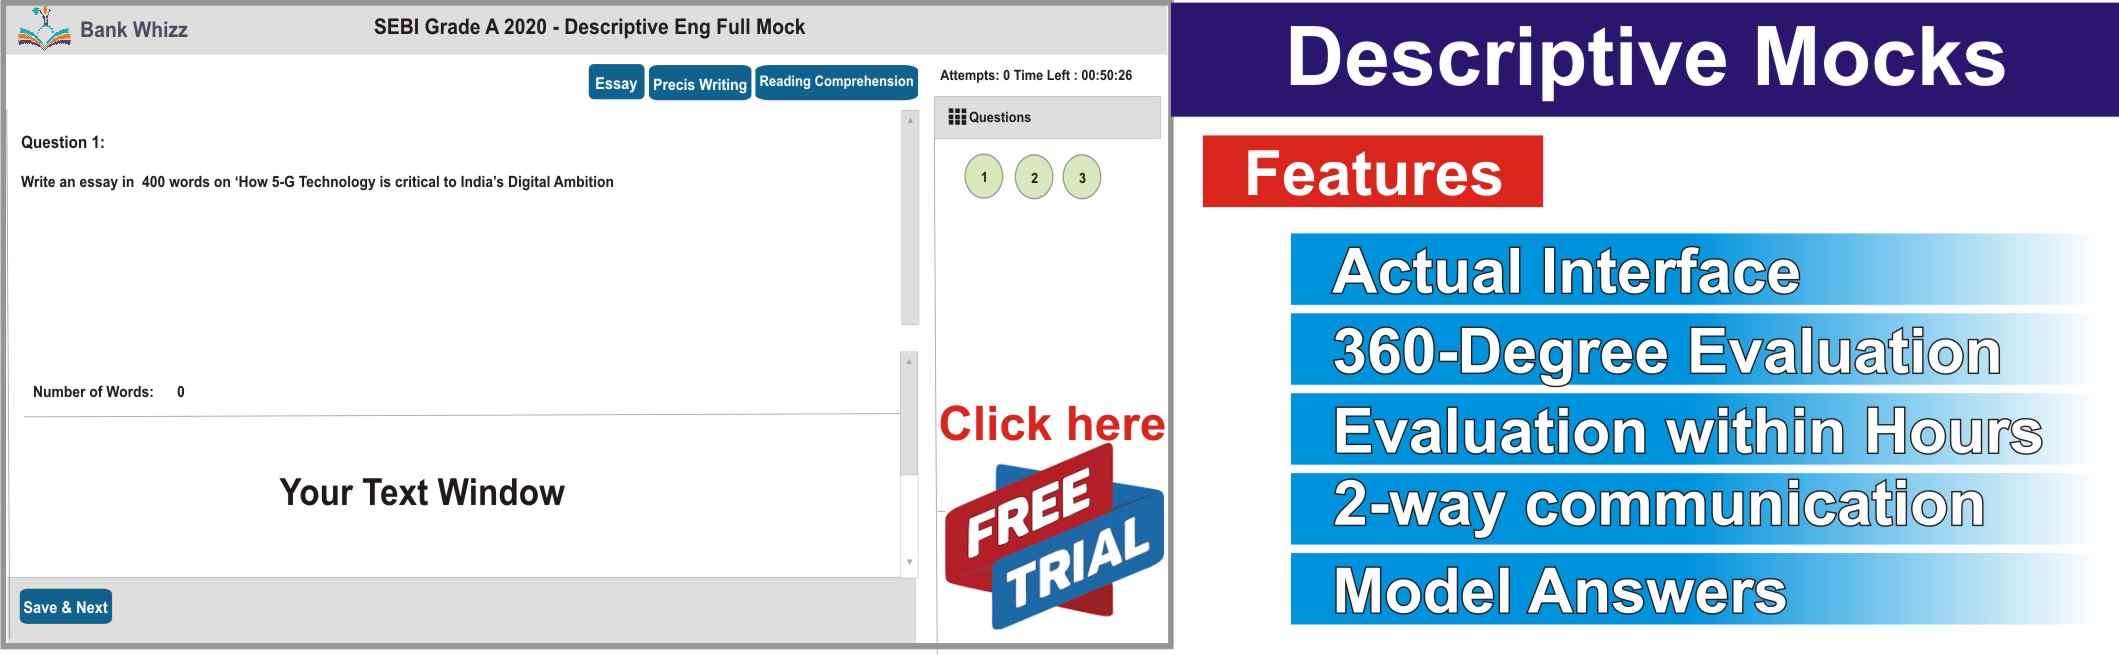 Descriptive English Mock Test for SEBI, NABARD, RBI, IRDA